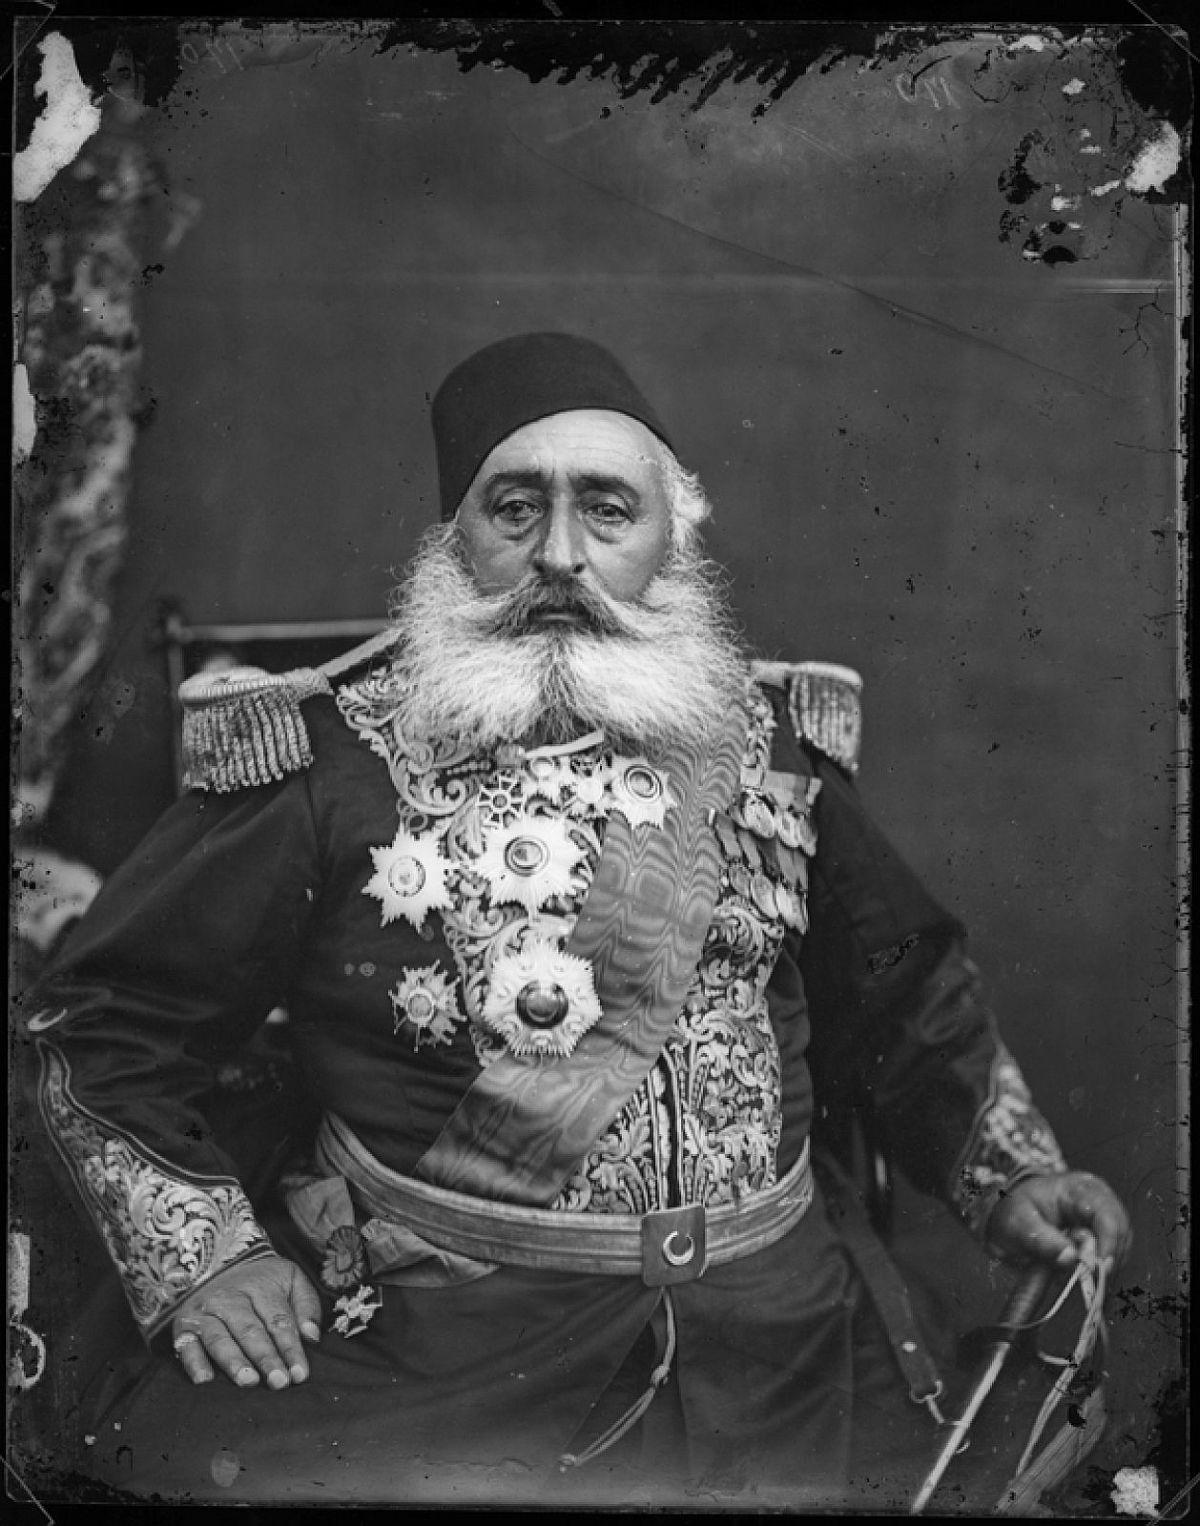 the-marubi-dynasty-a-hundred-years-of-albanian-studio-photography-04